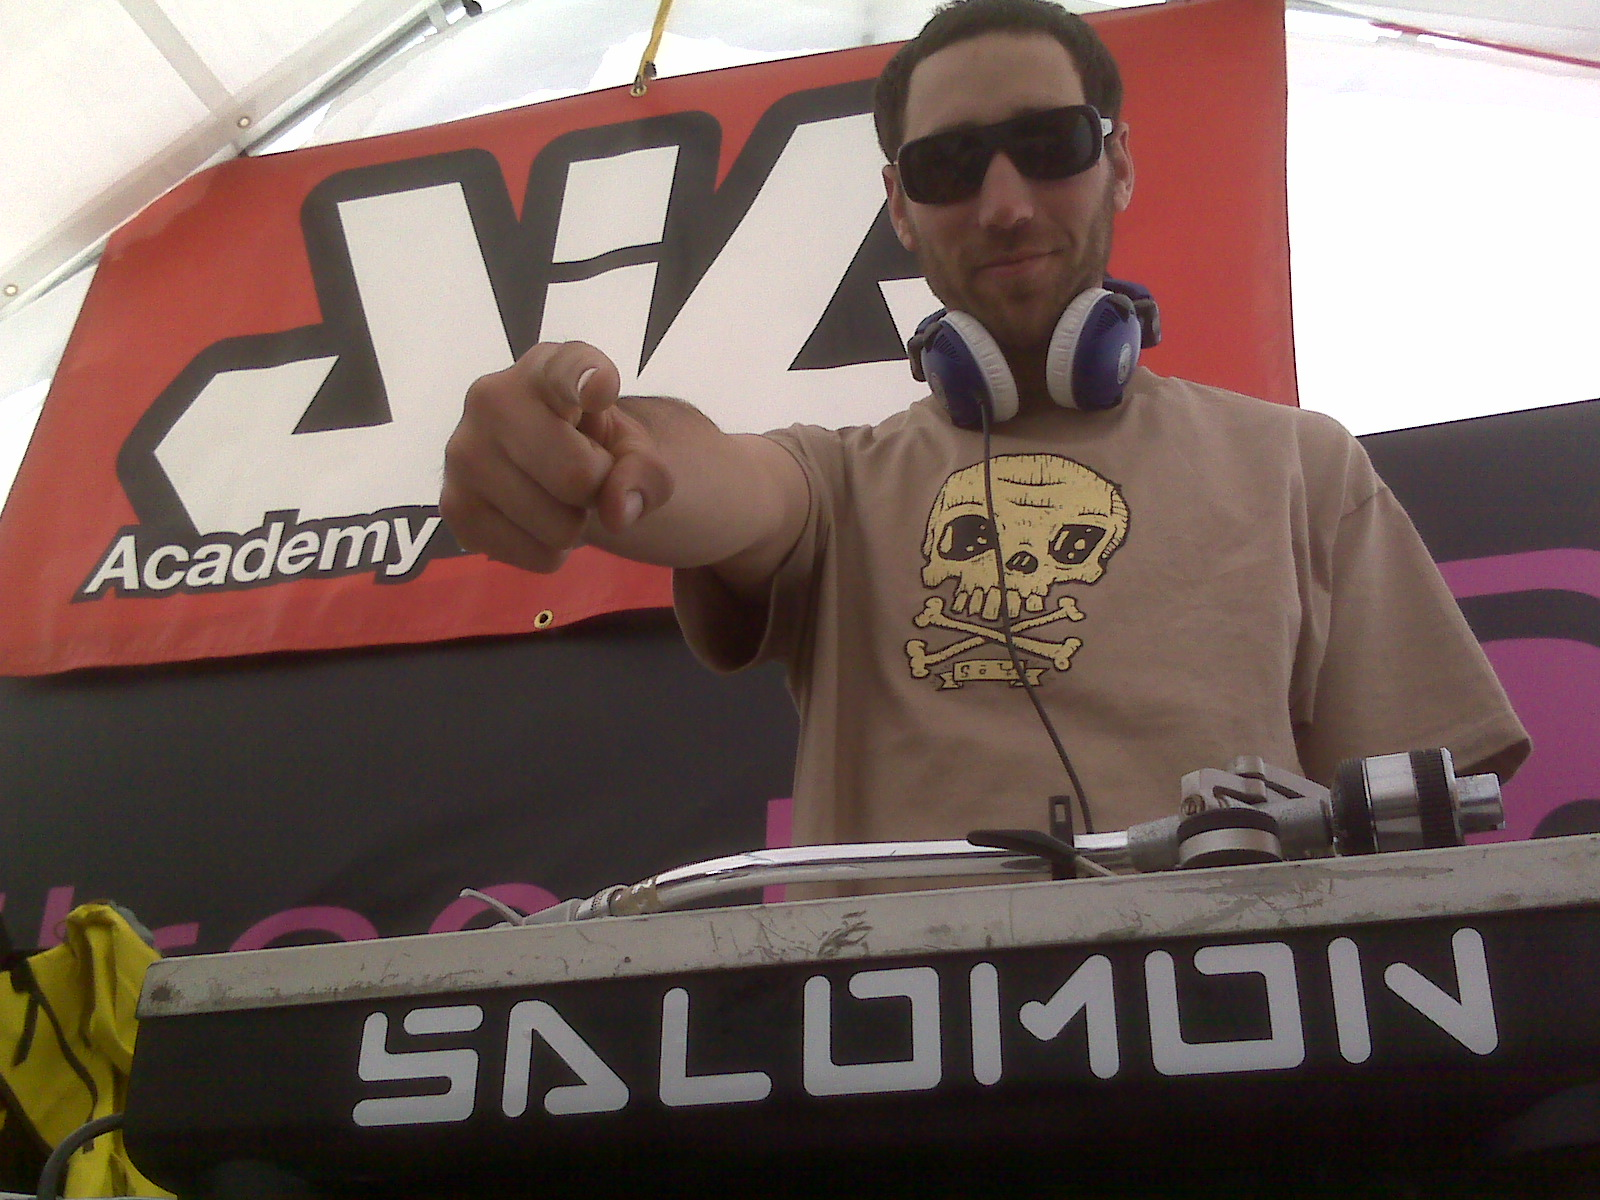 DJ Dakota spiiinning tracks at Momentum